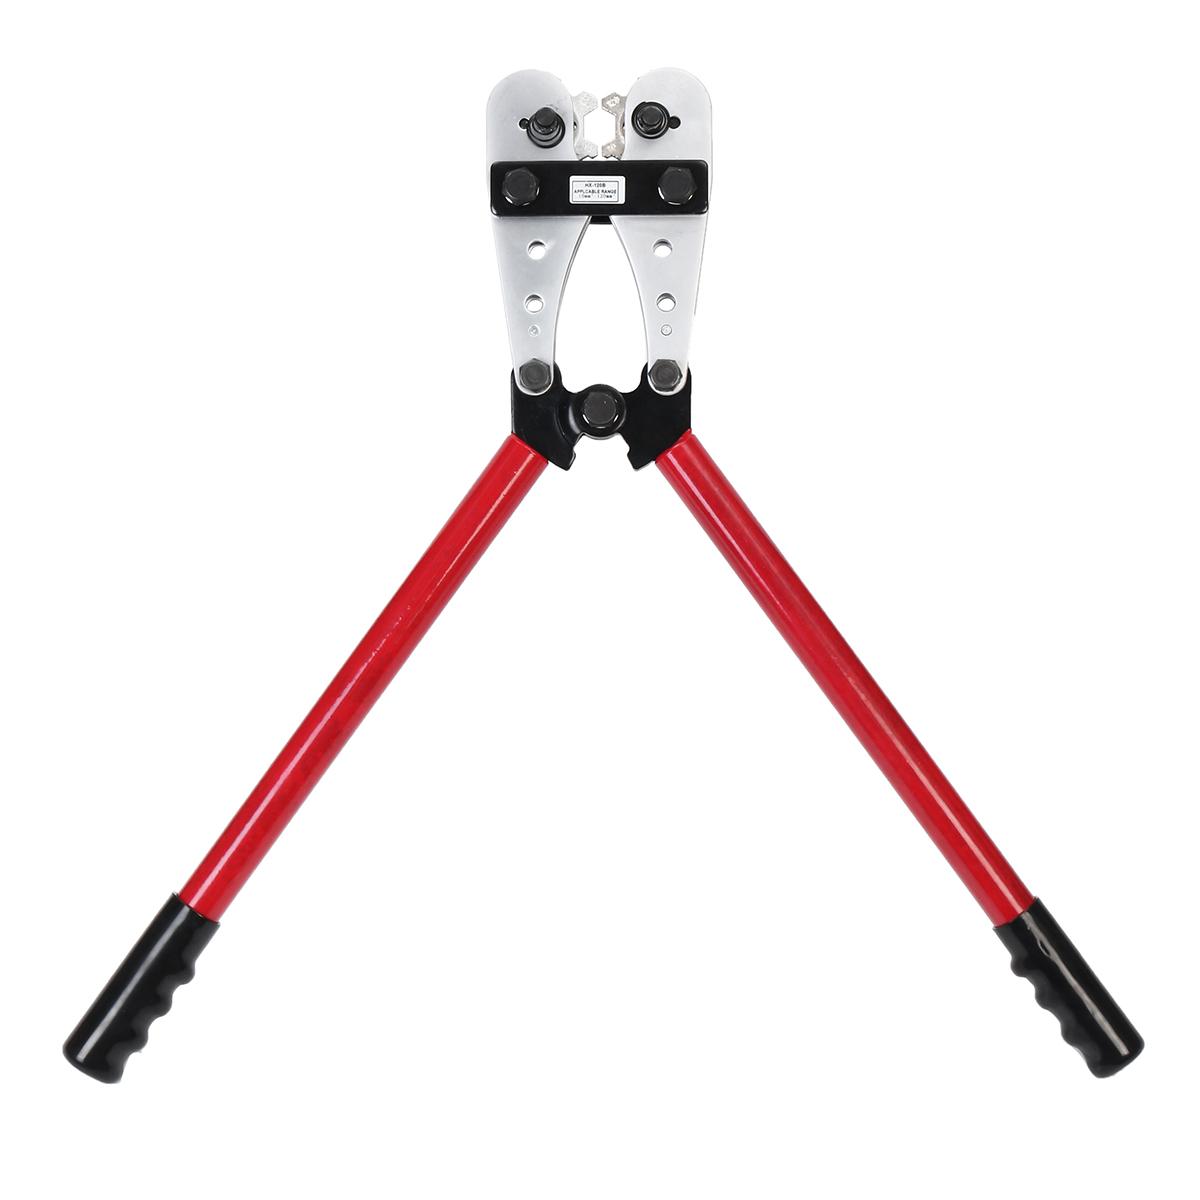 Купить со скидкой 10-120mm² Cable Wire Plier Crimper Plier Crimping Cutter Tool Terminal Lug HX-120B Y.O